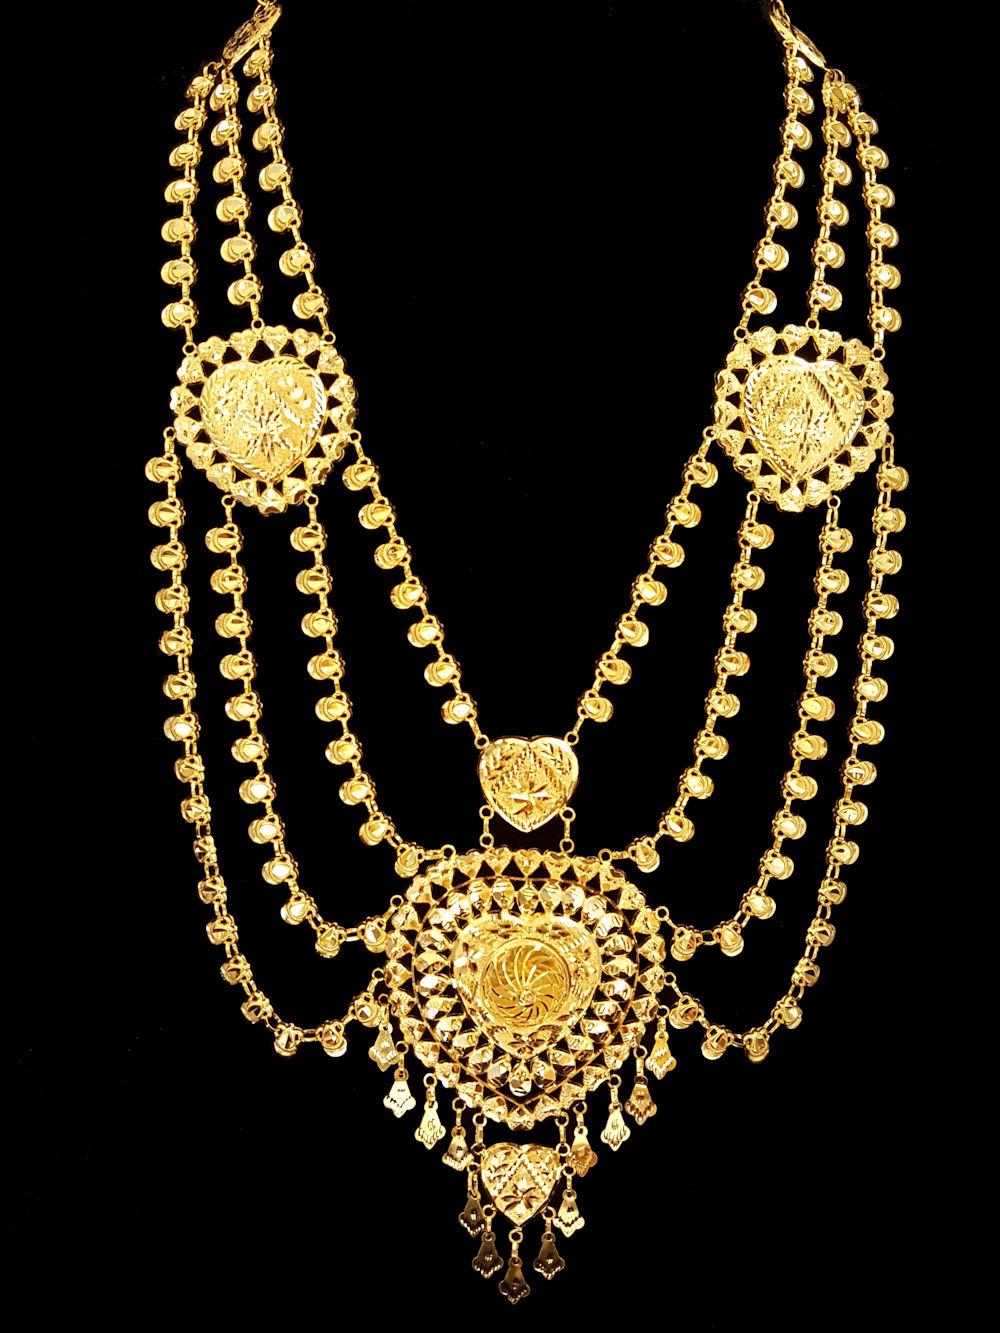 21k gold necklace (1259) – Alquds Jewelry